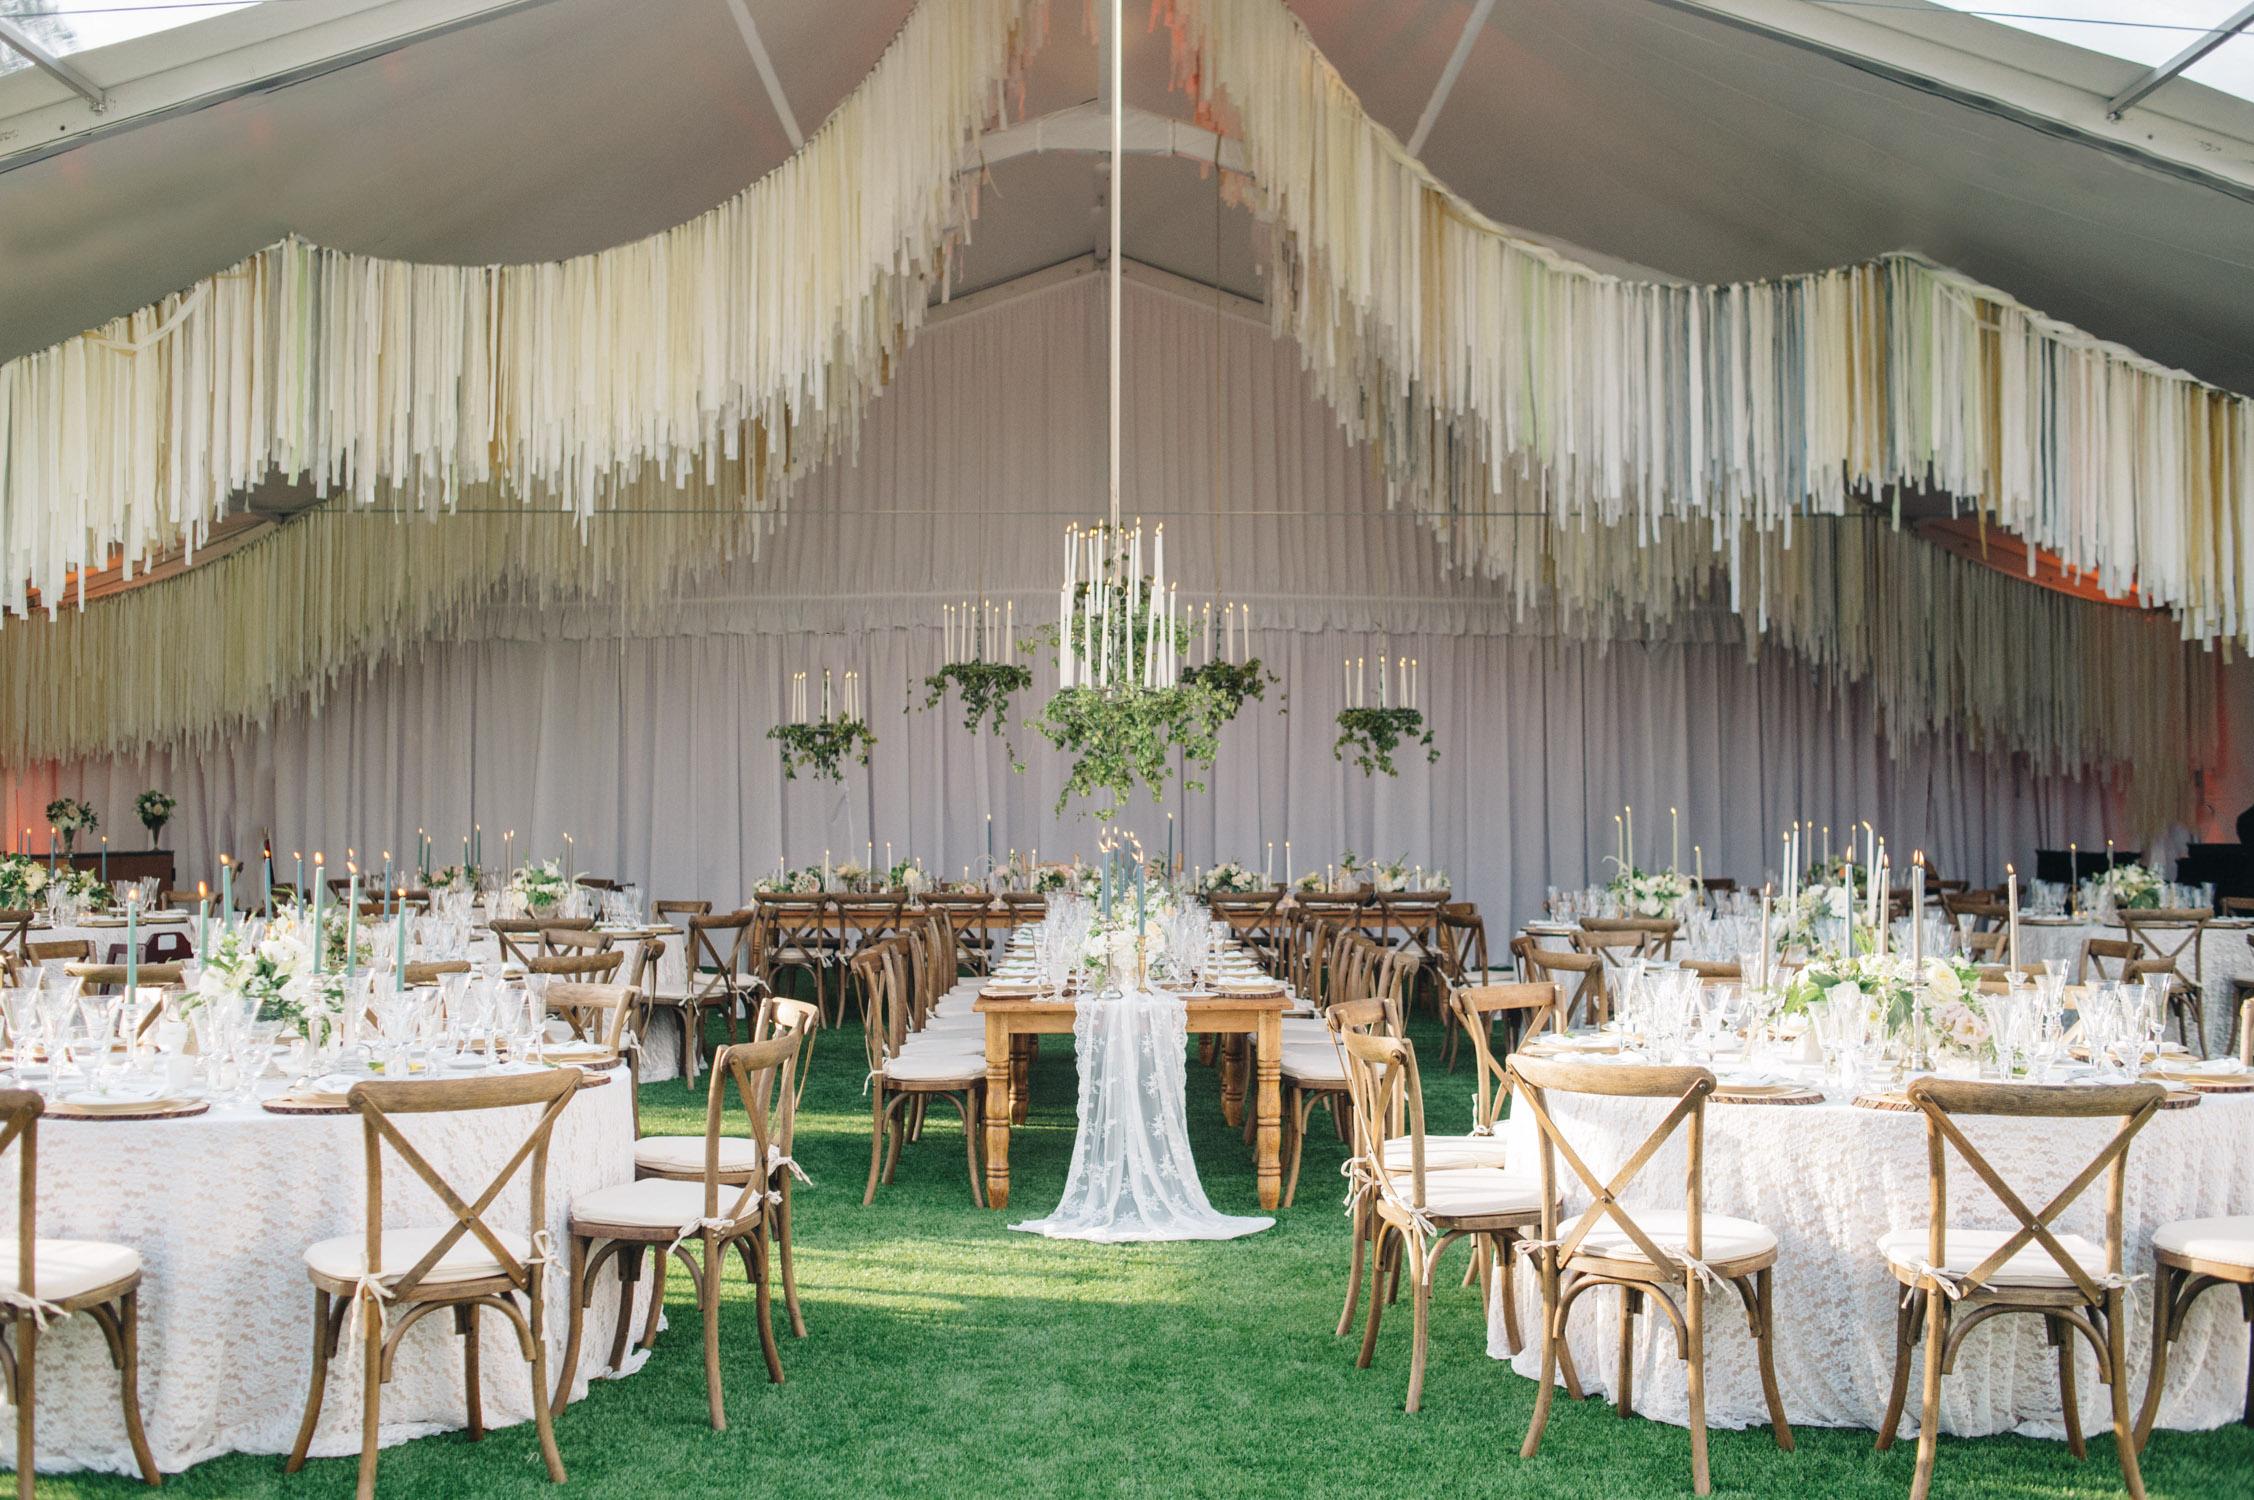 Lake Placid Wedding by Tara Kneiser